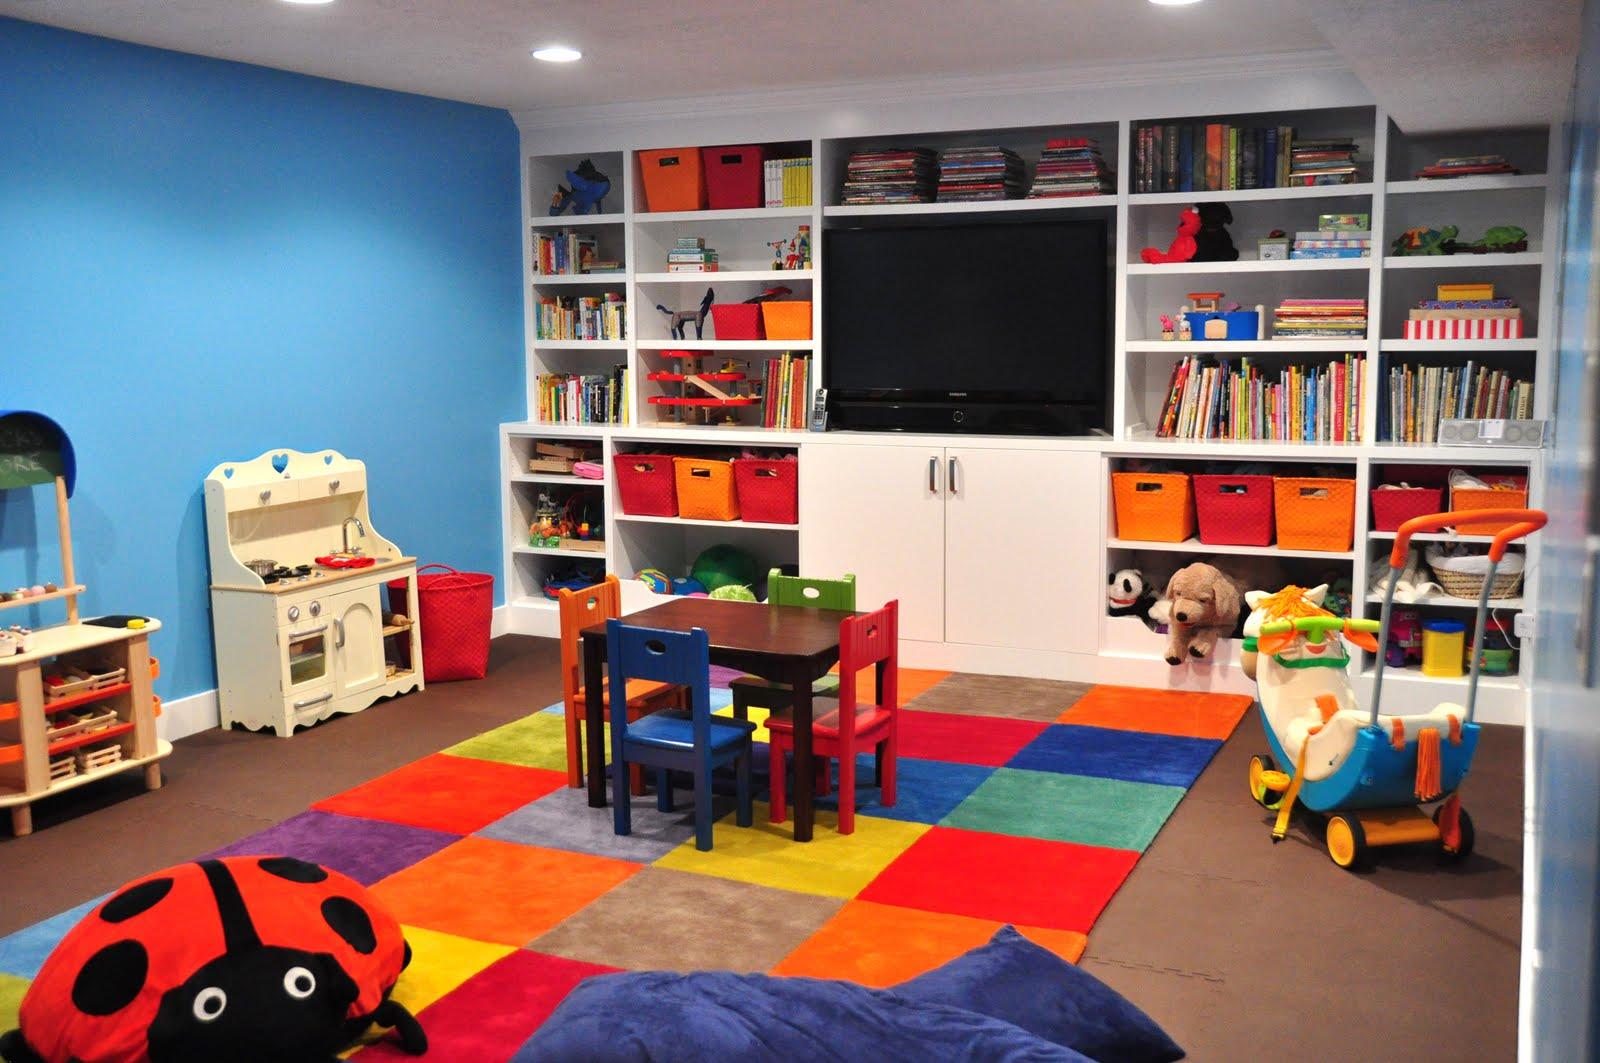 idees ranger chambre enfant solutions rangement bebe adolescent - Rangement Chambre D Enfant